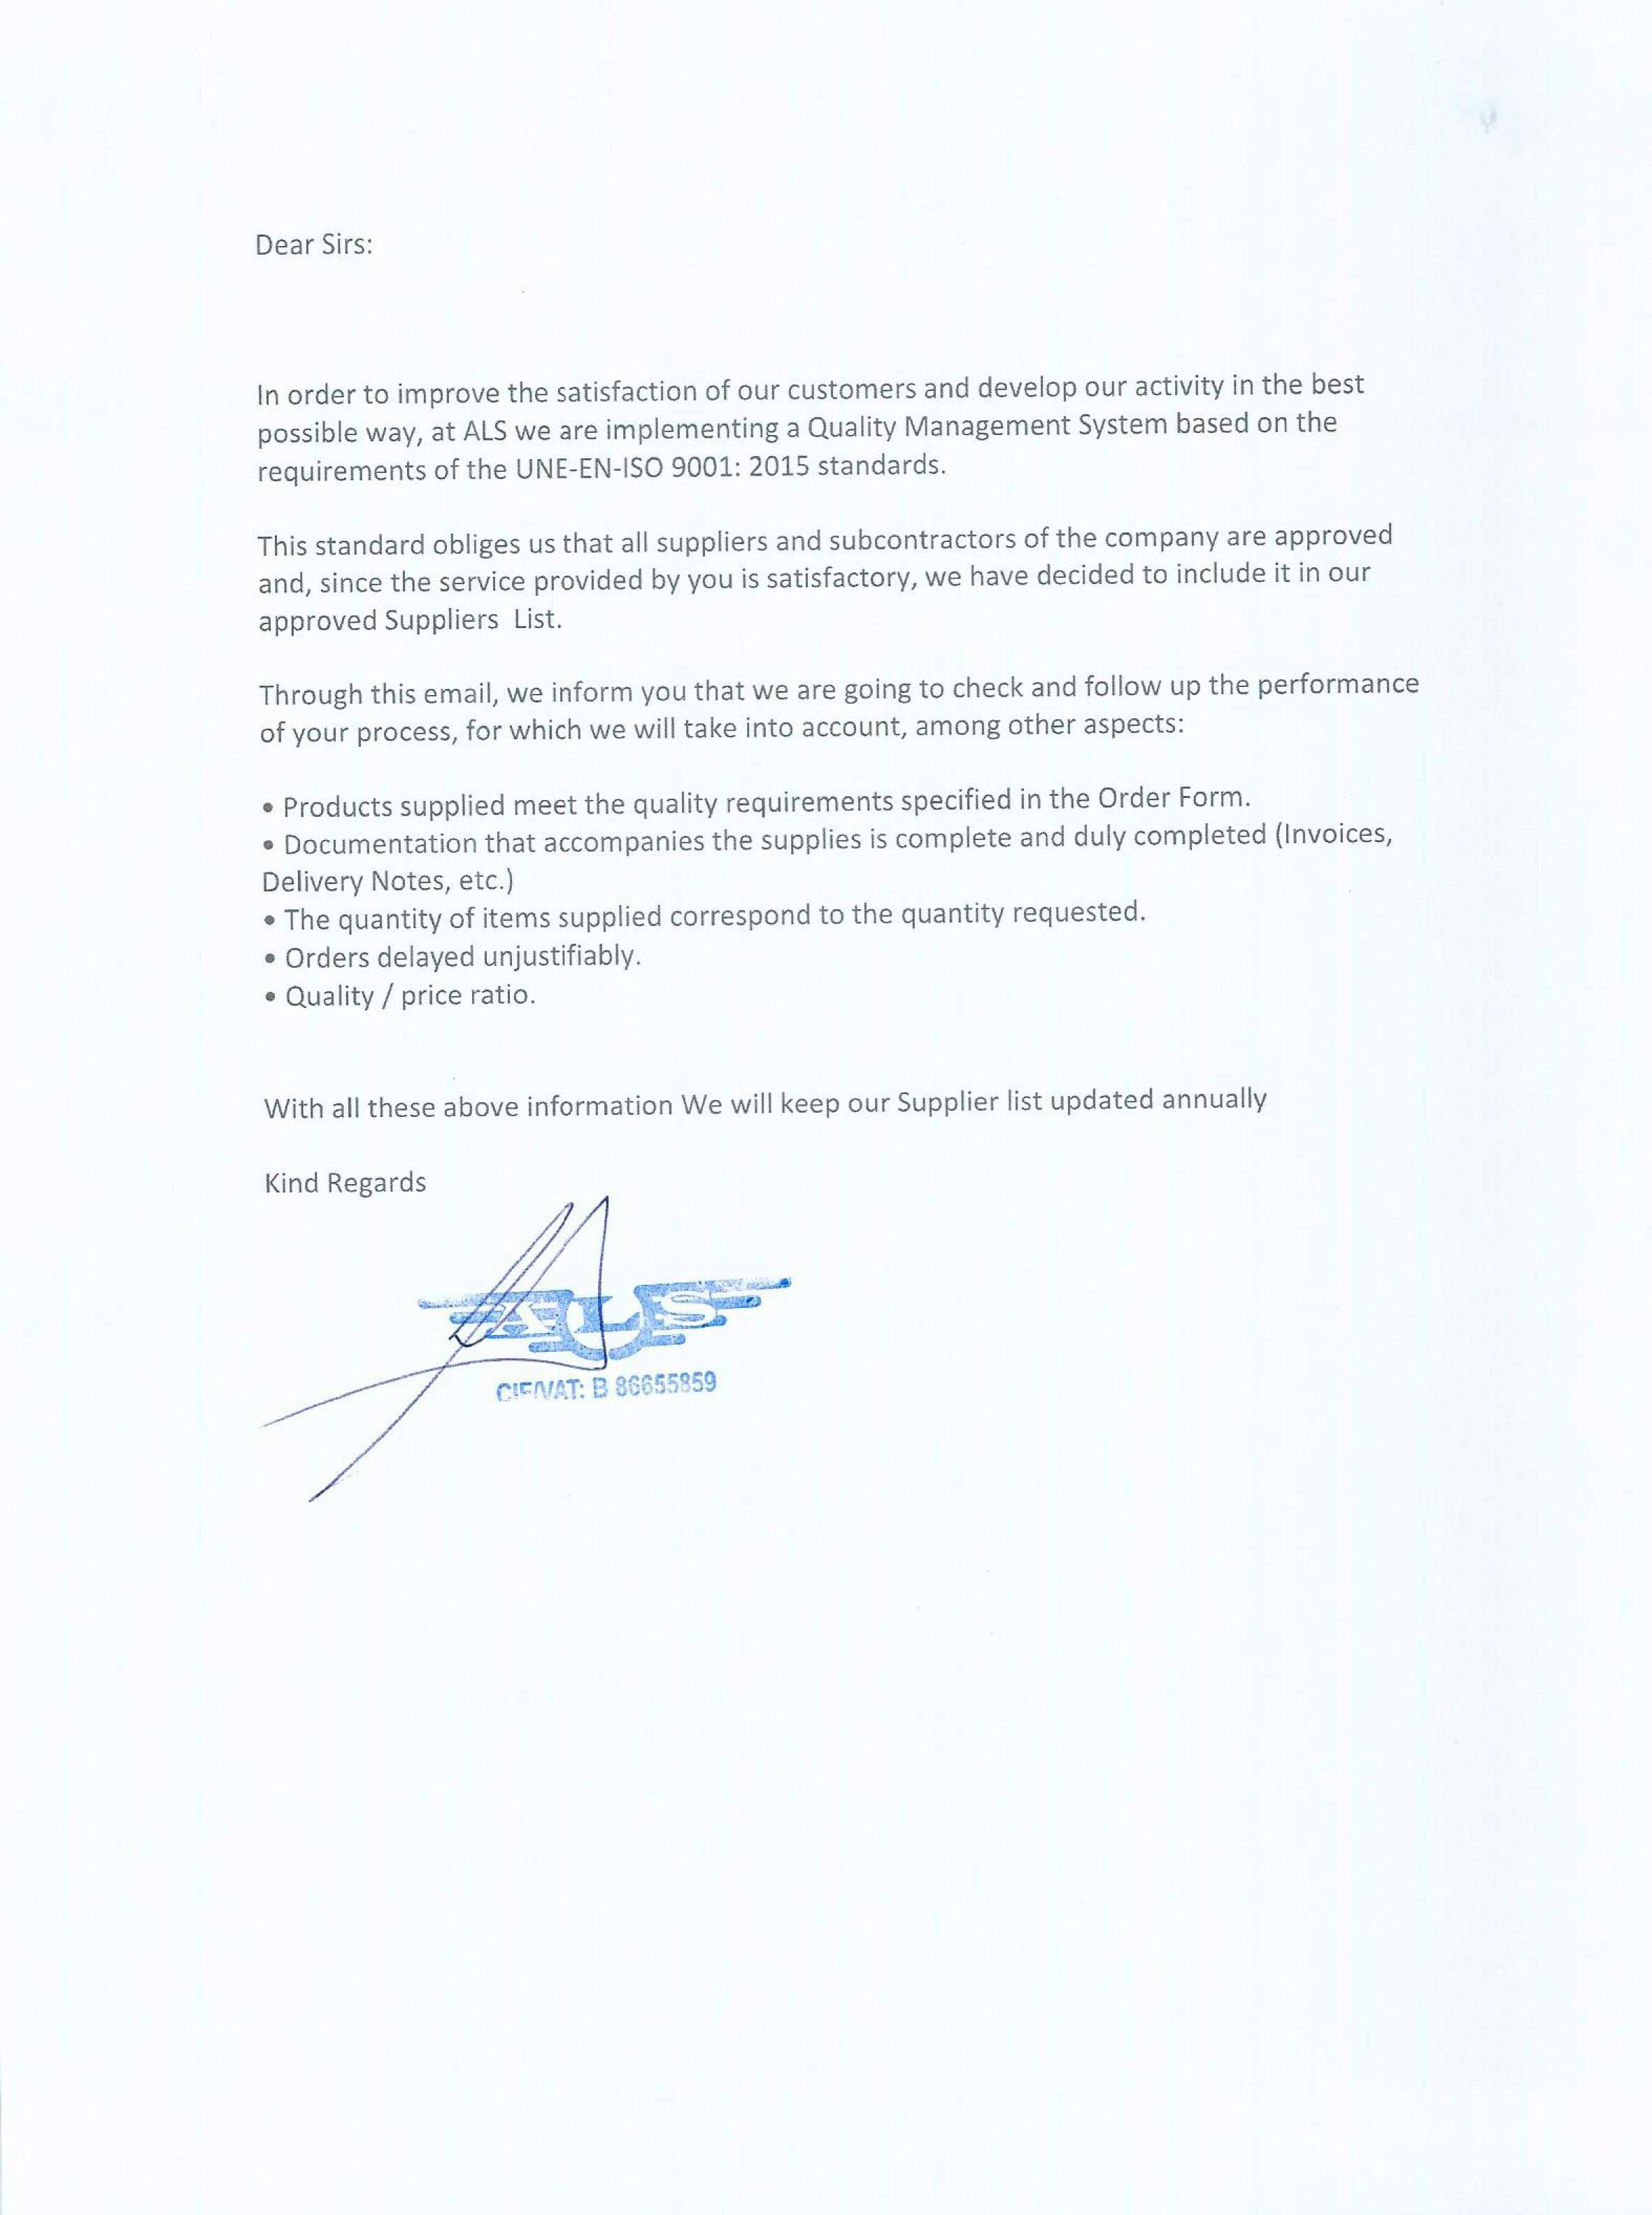 Certificate Alspares